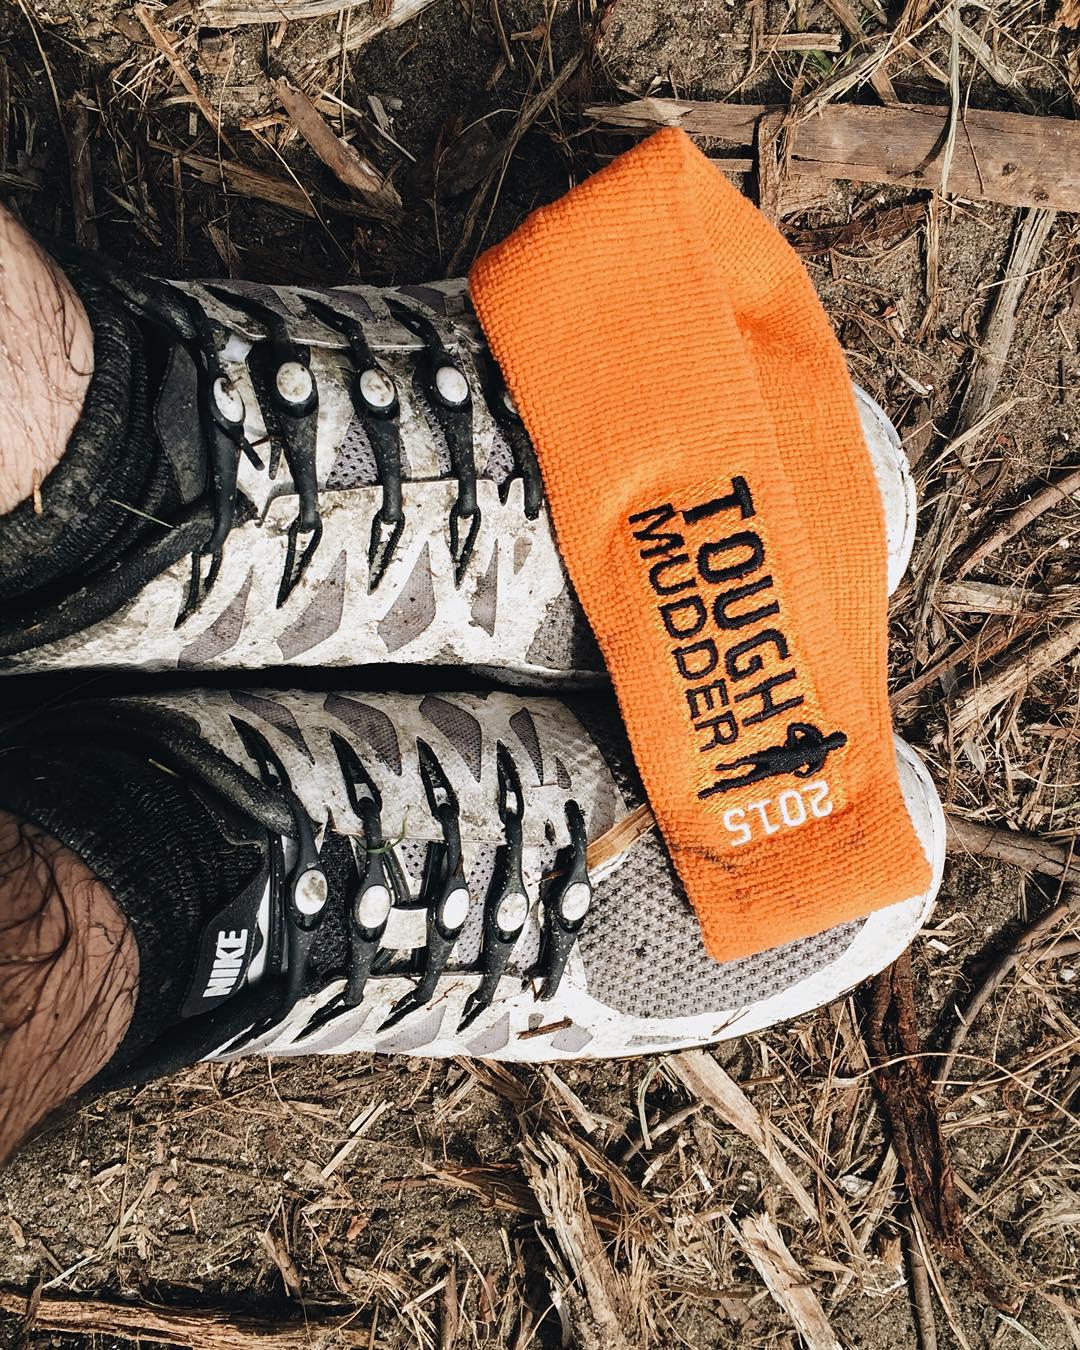 Bring on the mud.